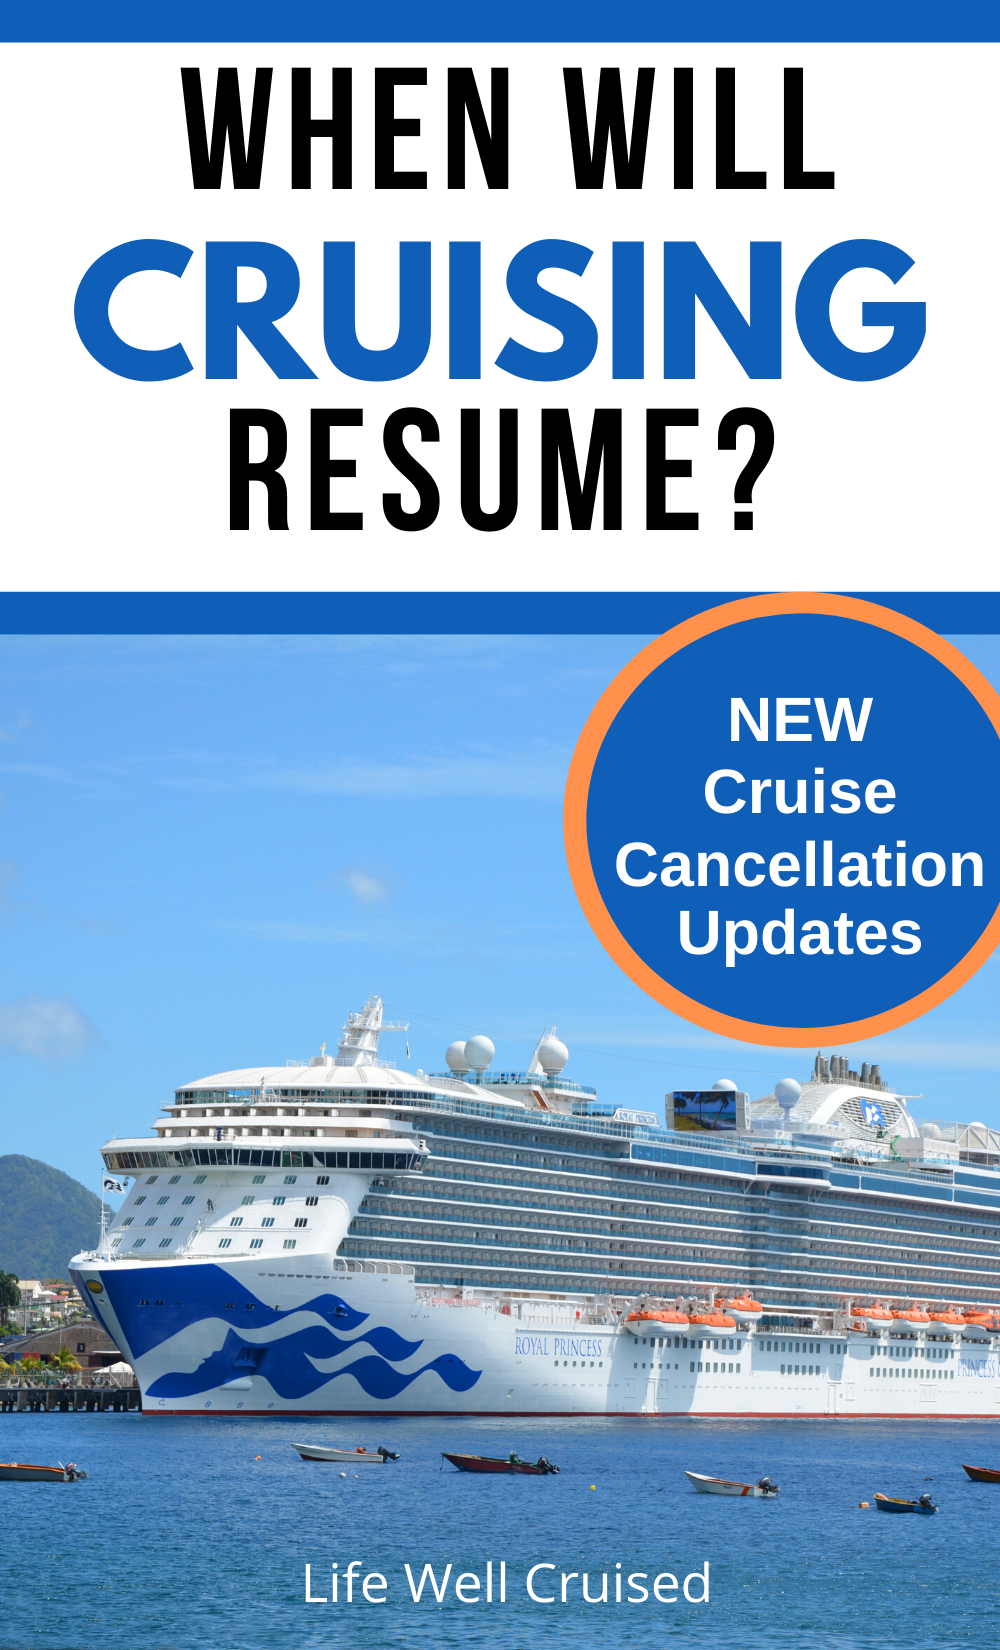 Royal Caribbean is Returning to St. Thomas, St. Maarten